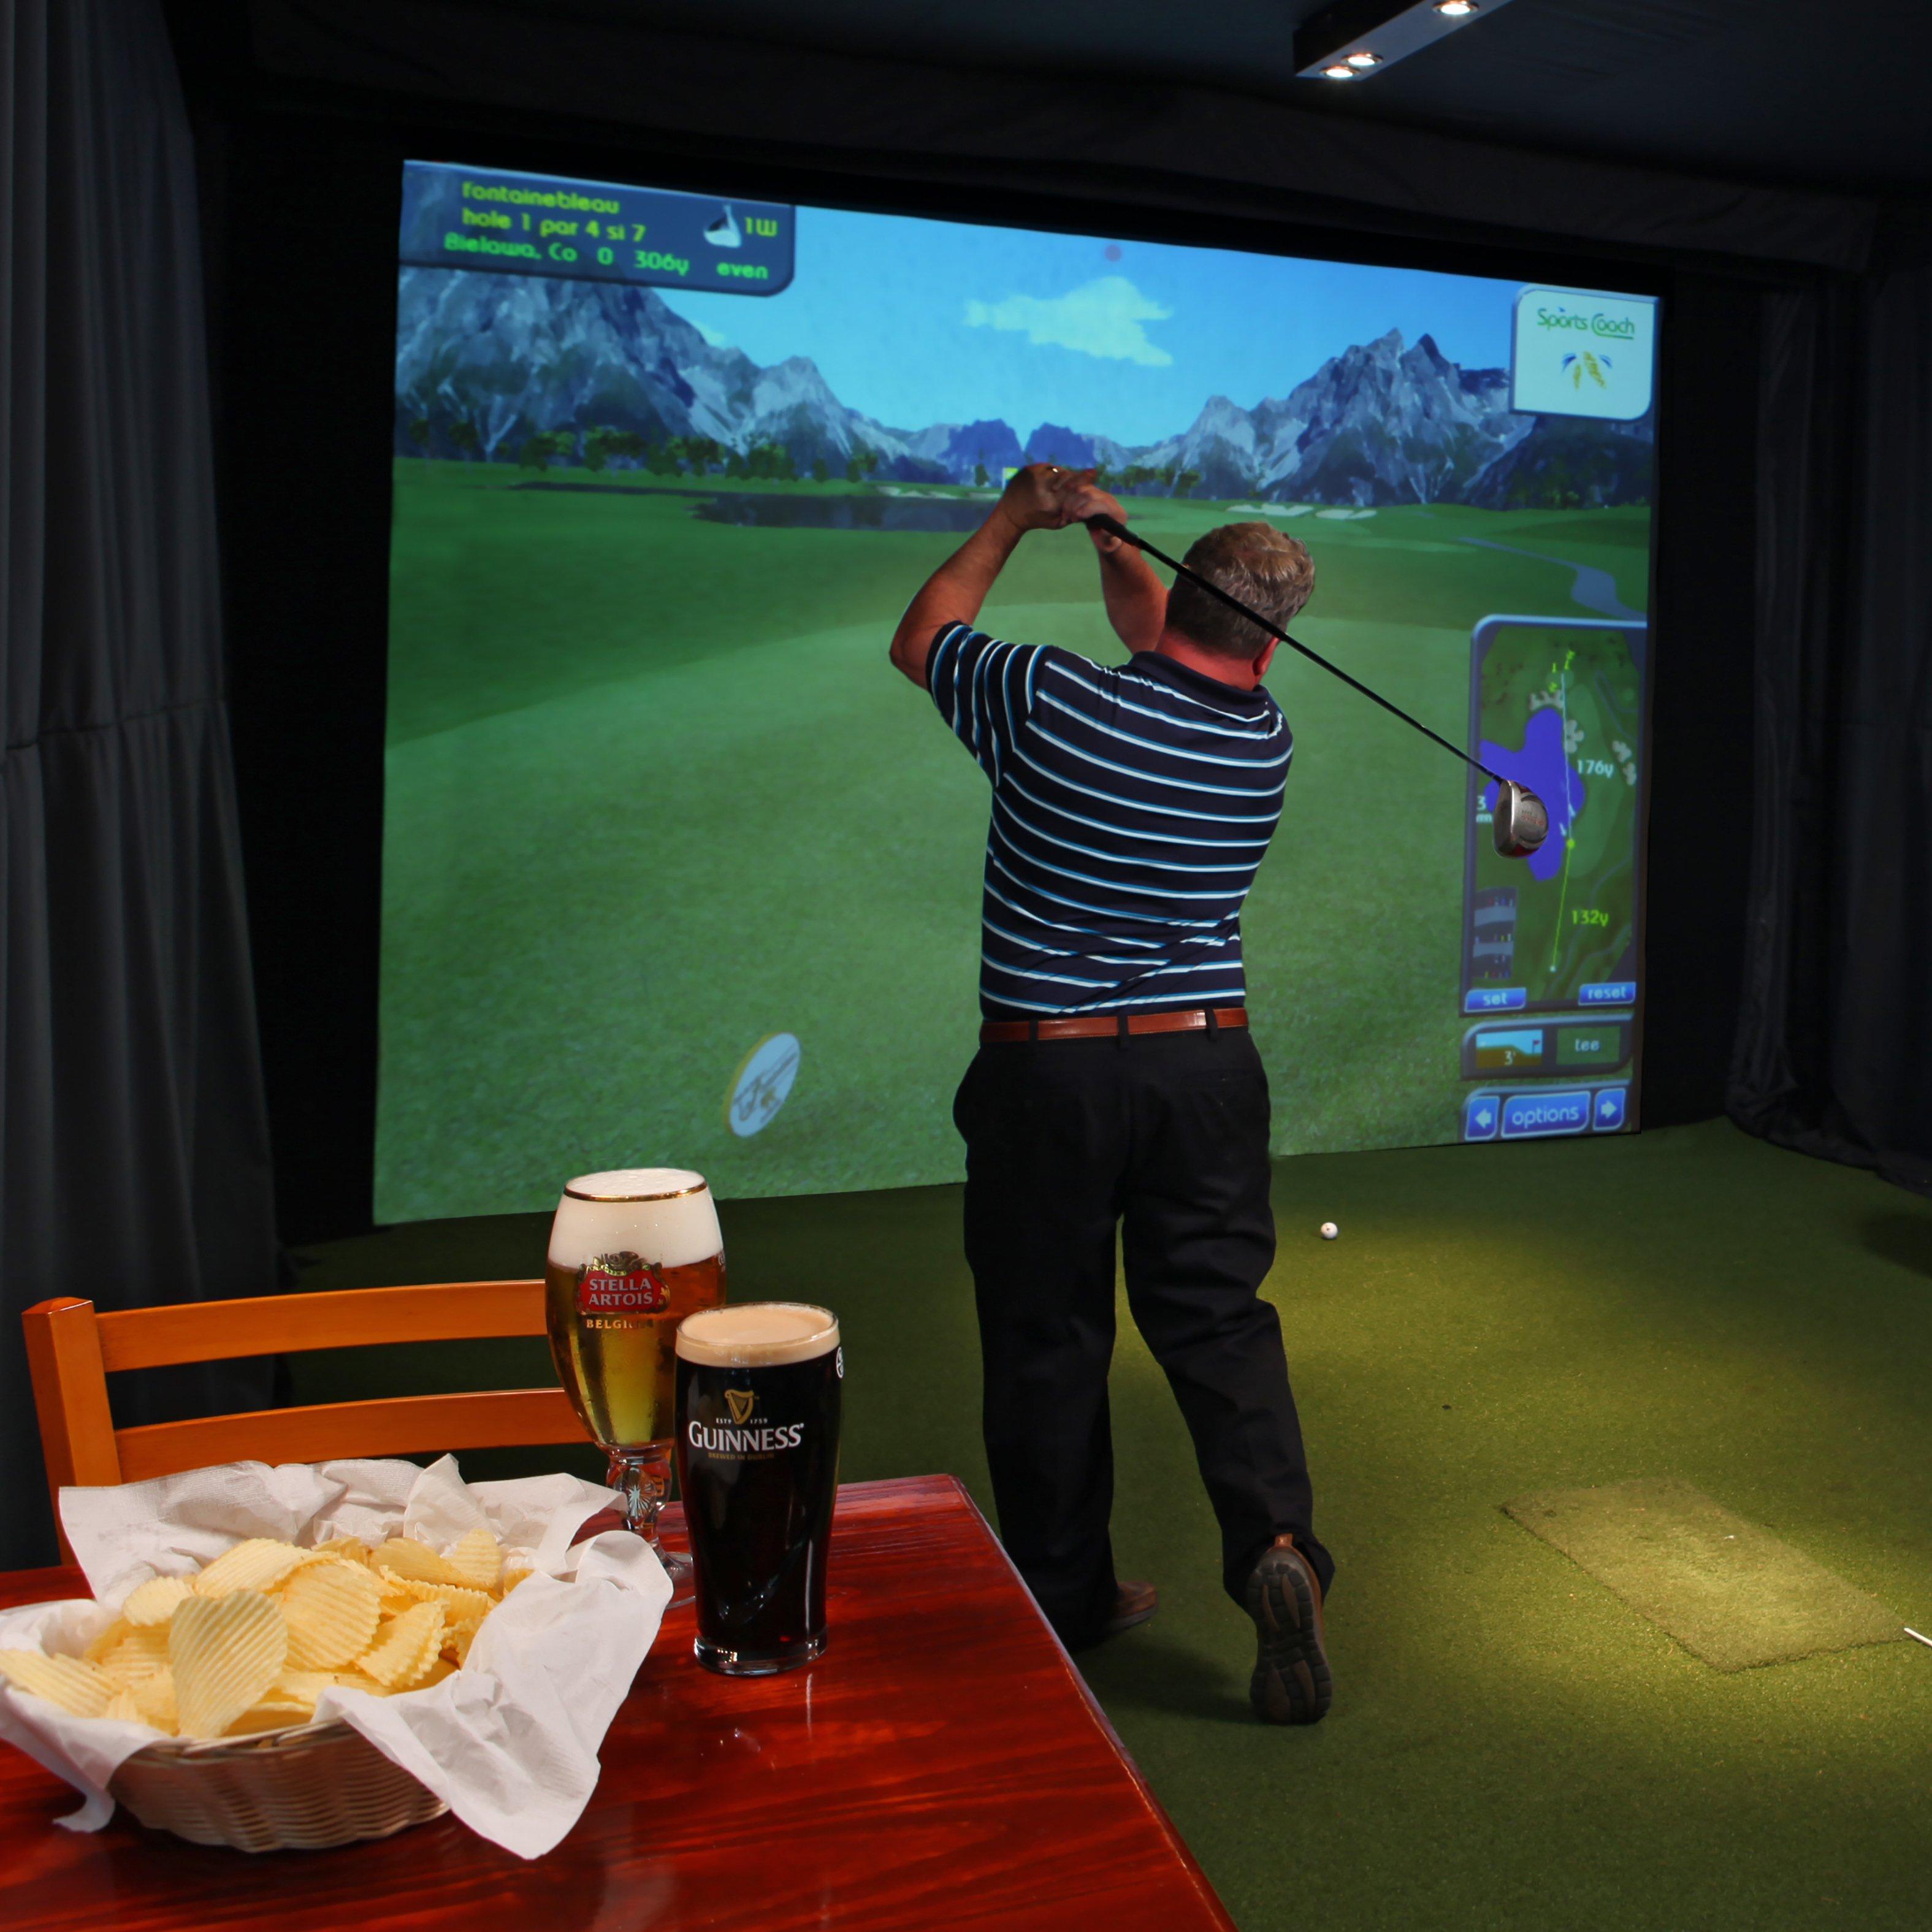 Indoor Golf Simulators in Troy, NY